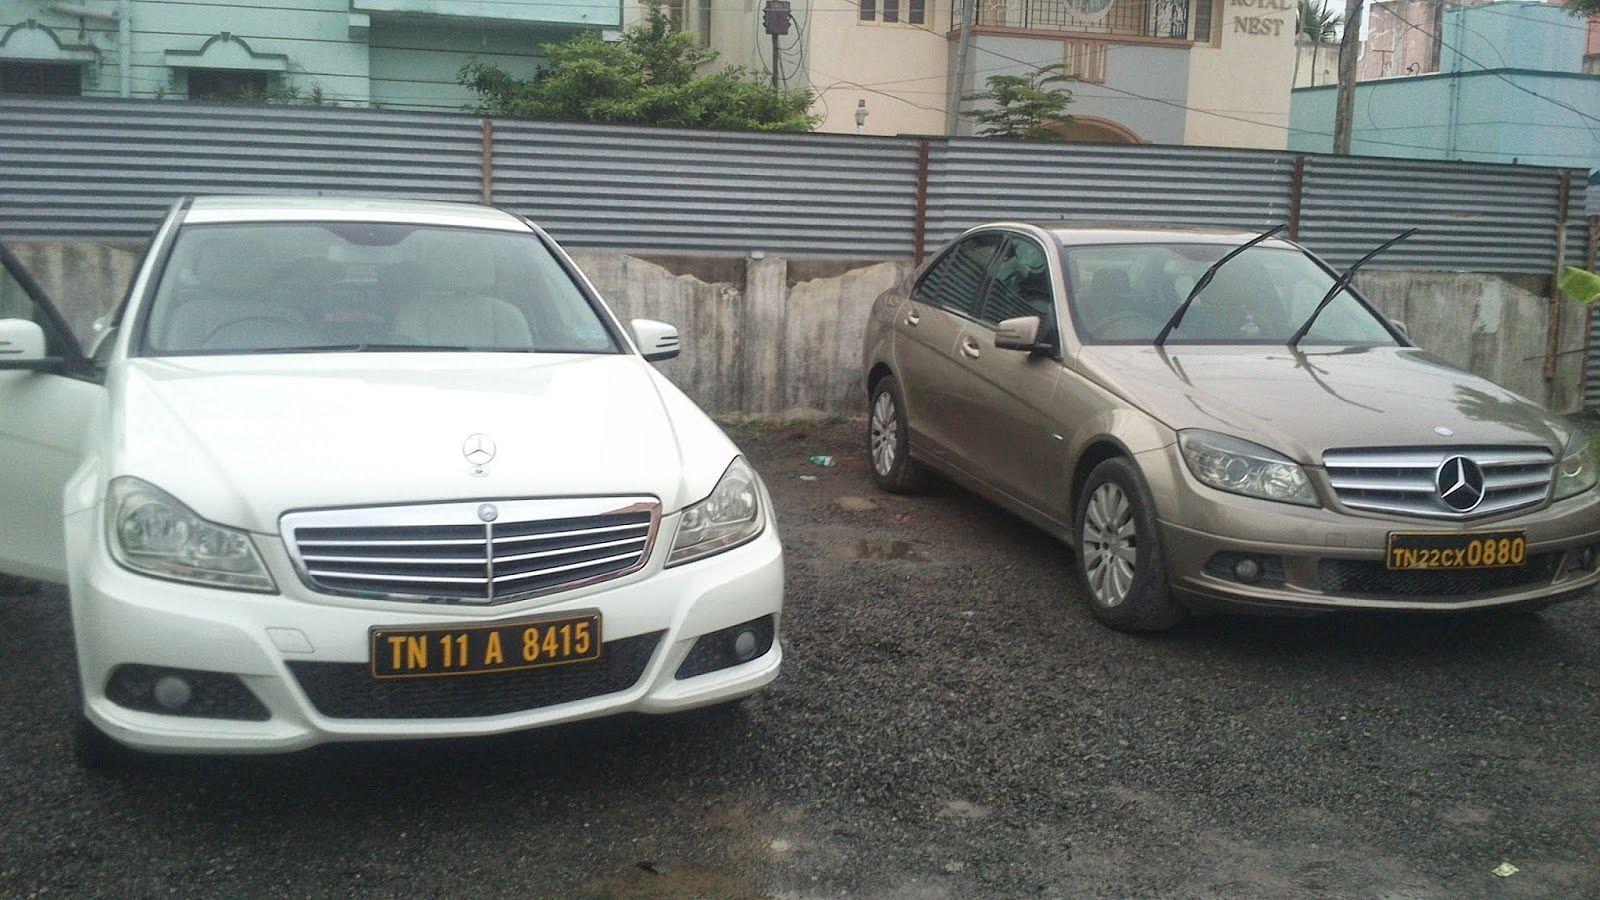 car on lease